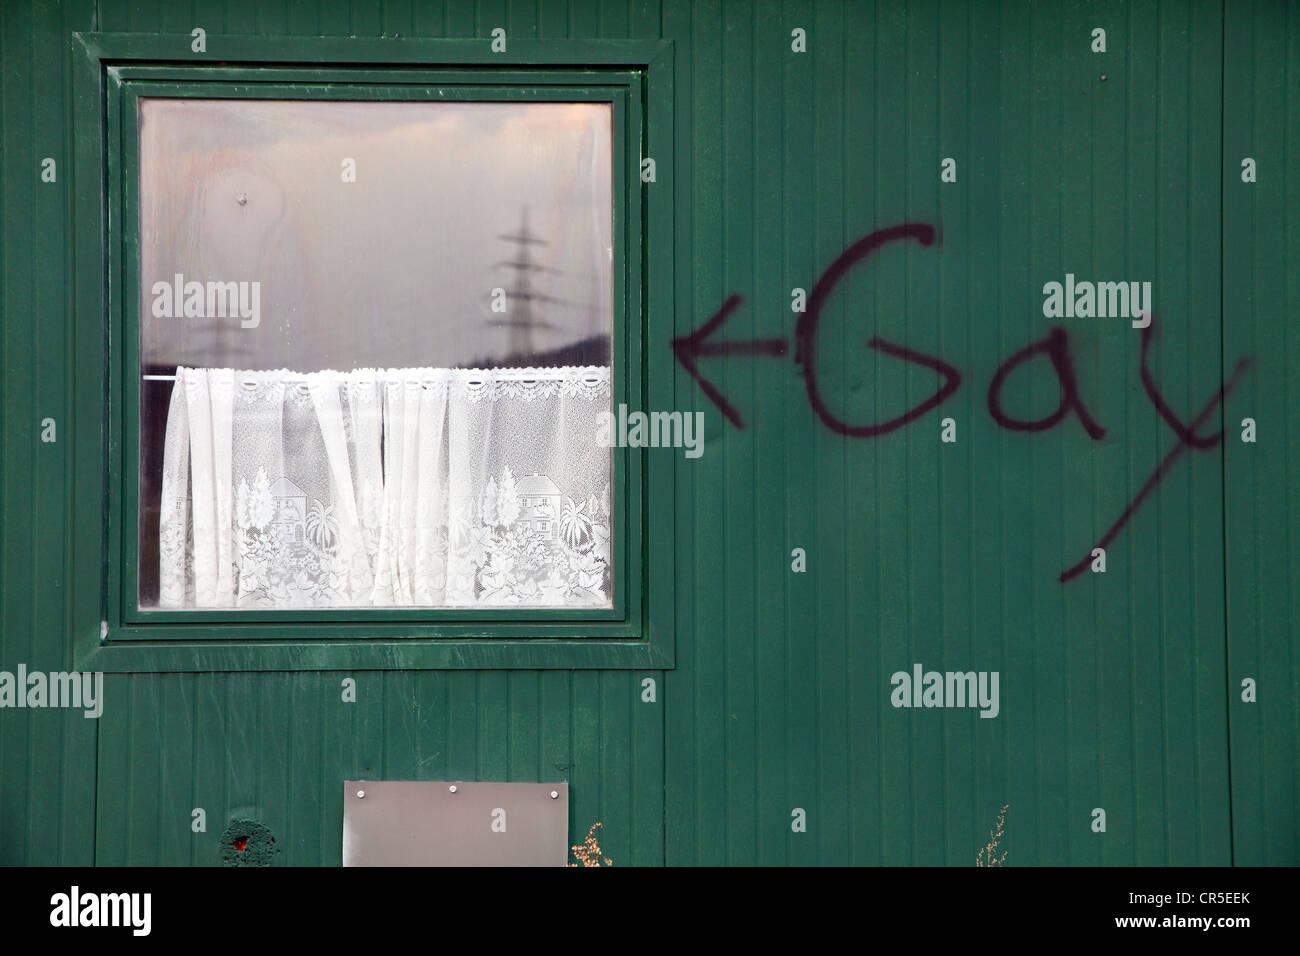 Gay-Gay Graffiti on a trailer, a former trailer. Herten, North Rhine-Westphalia, Germany, Europe. Stock Photo